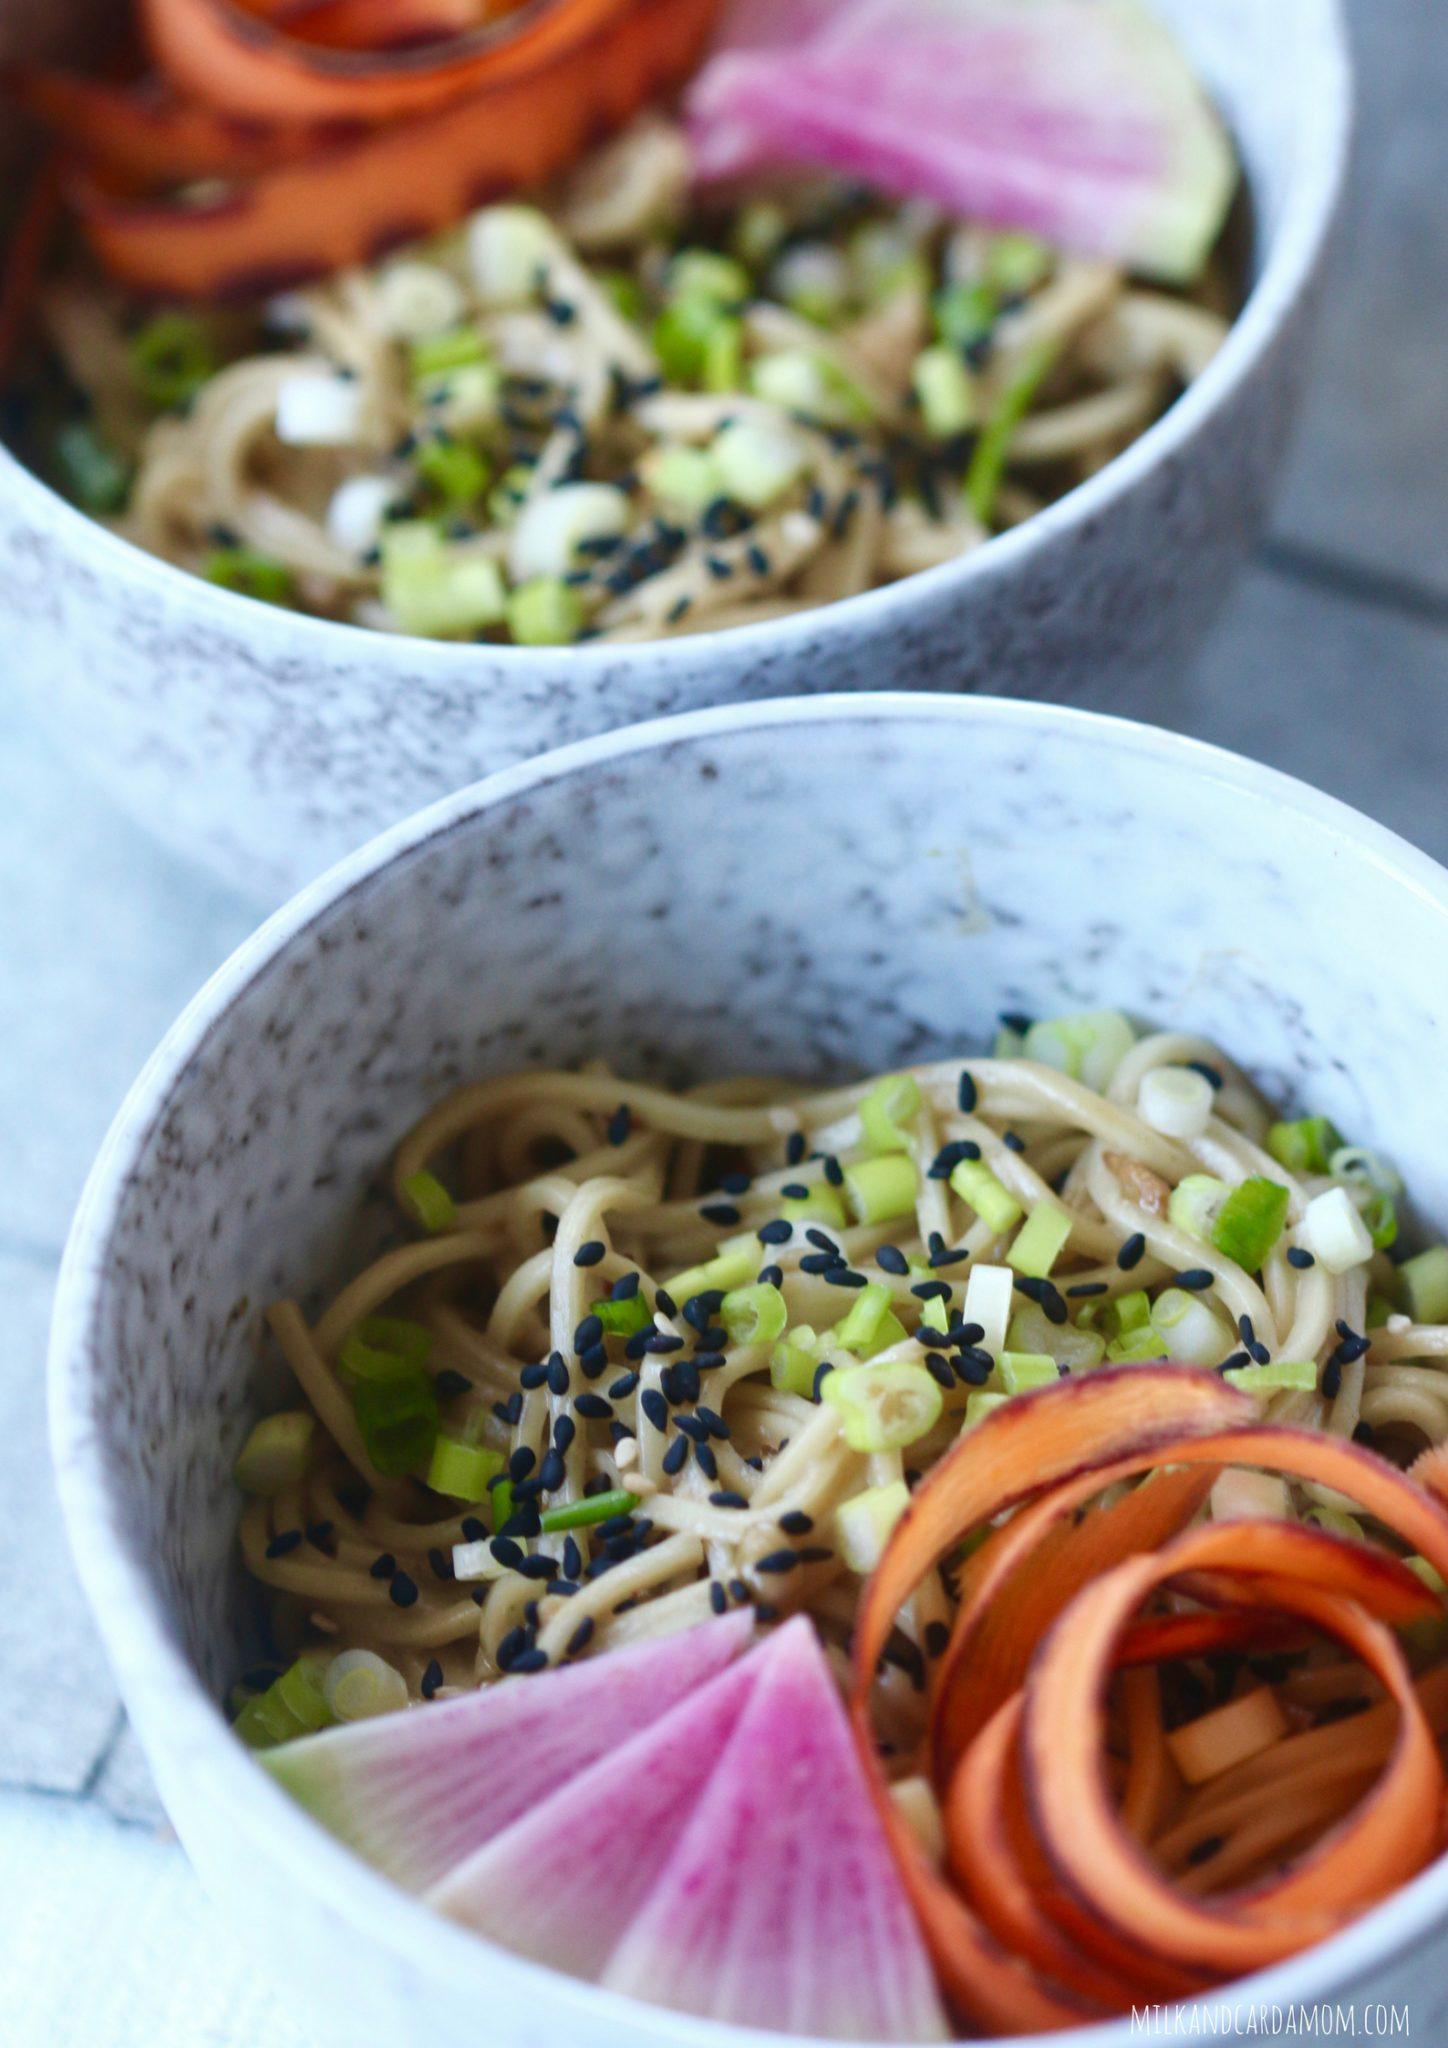 10 Minute Scallion Noodles (Peanut-Free)